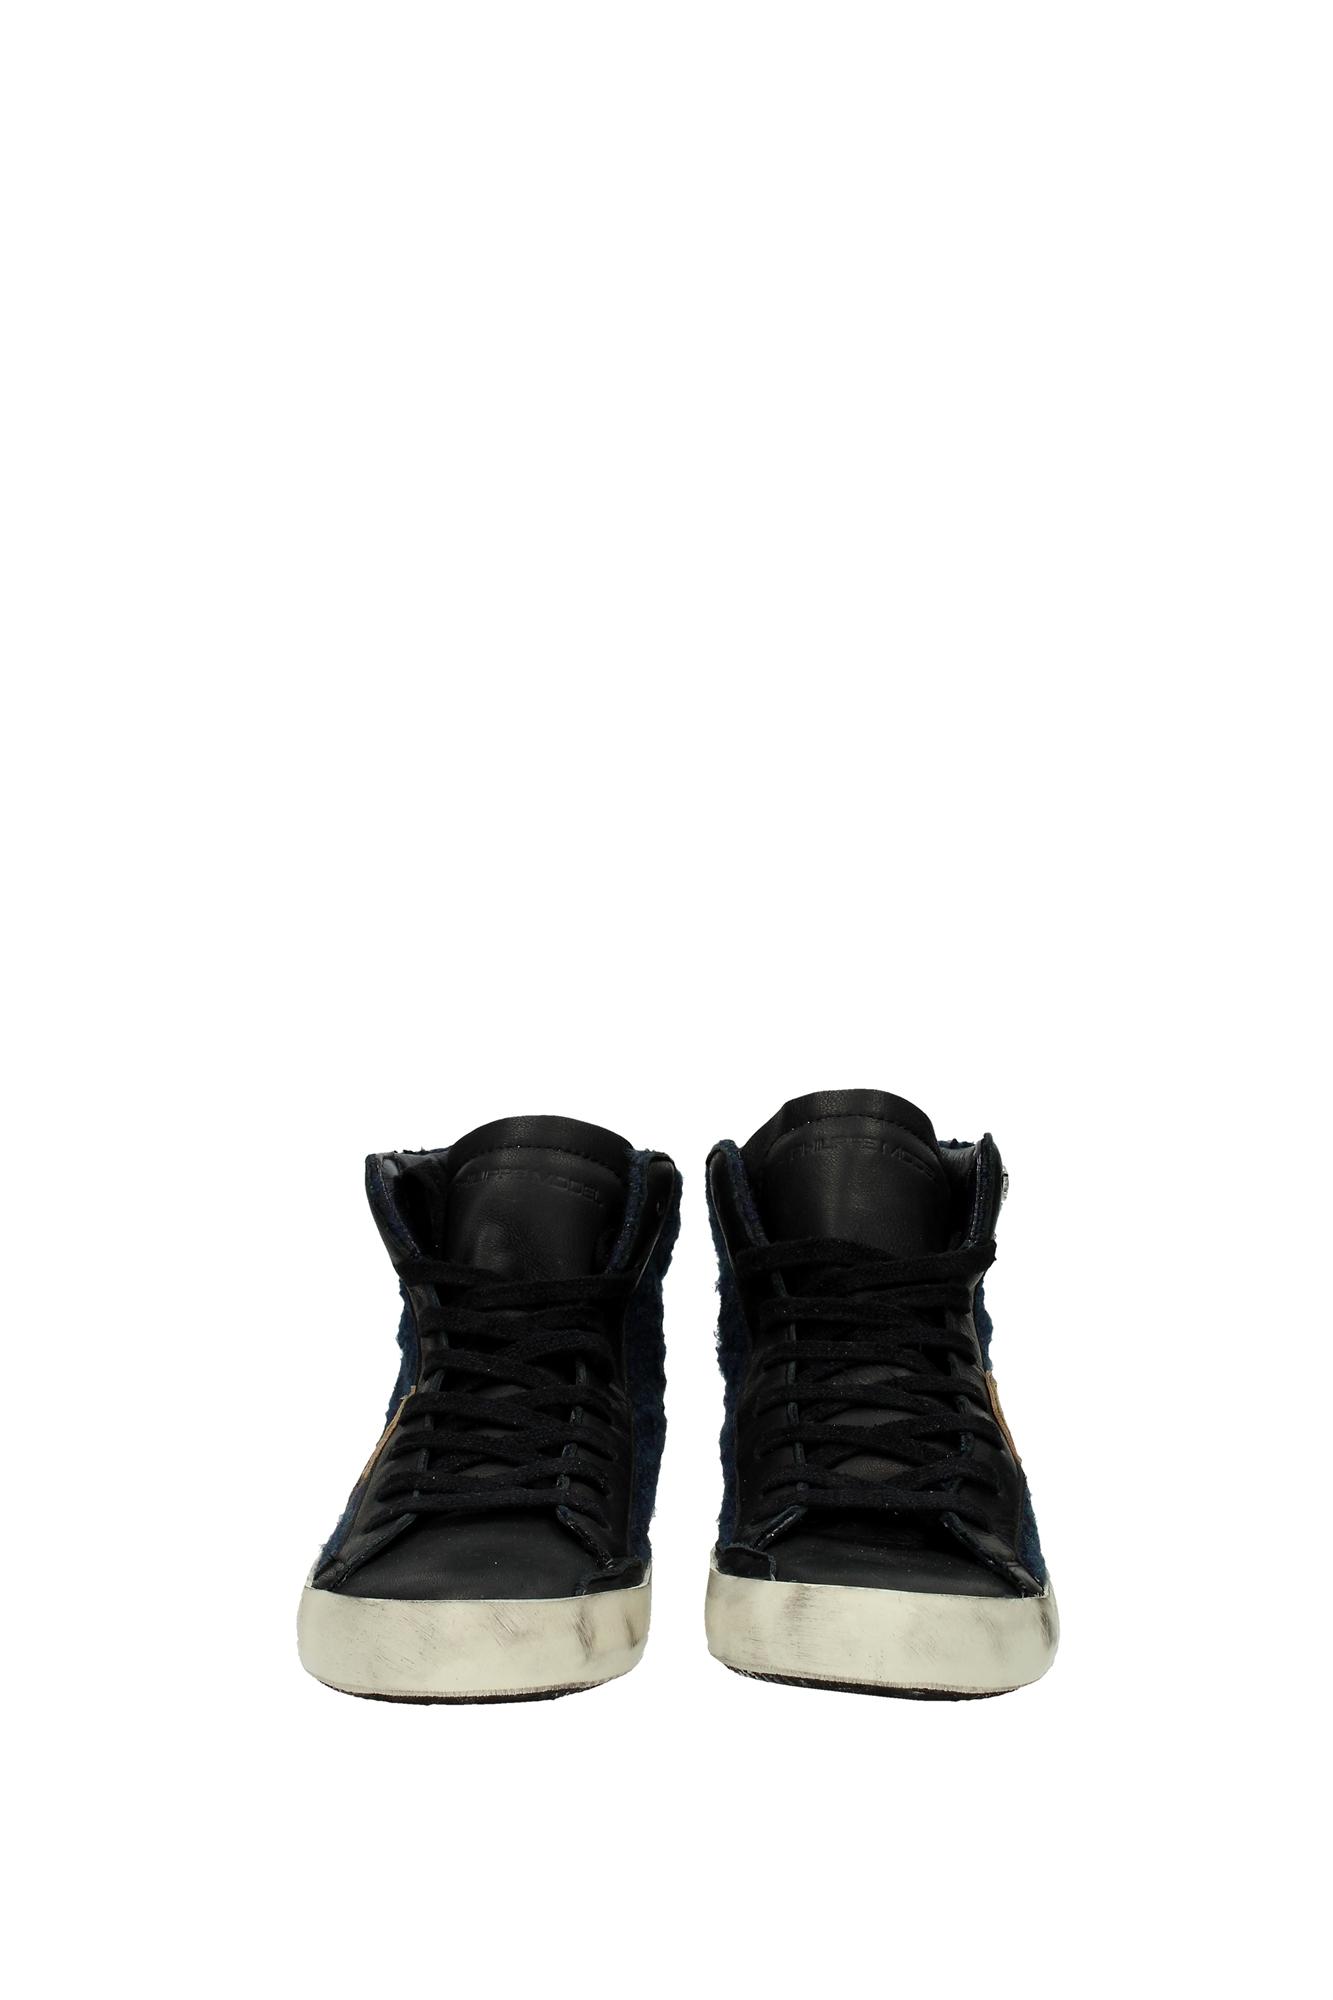 sneakers philippe model damen stoff schwarz clhddt01 ebay. Black Bedroom Furniture Sets. Home Design Ideas